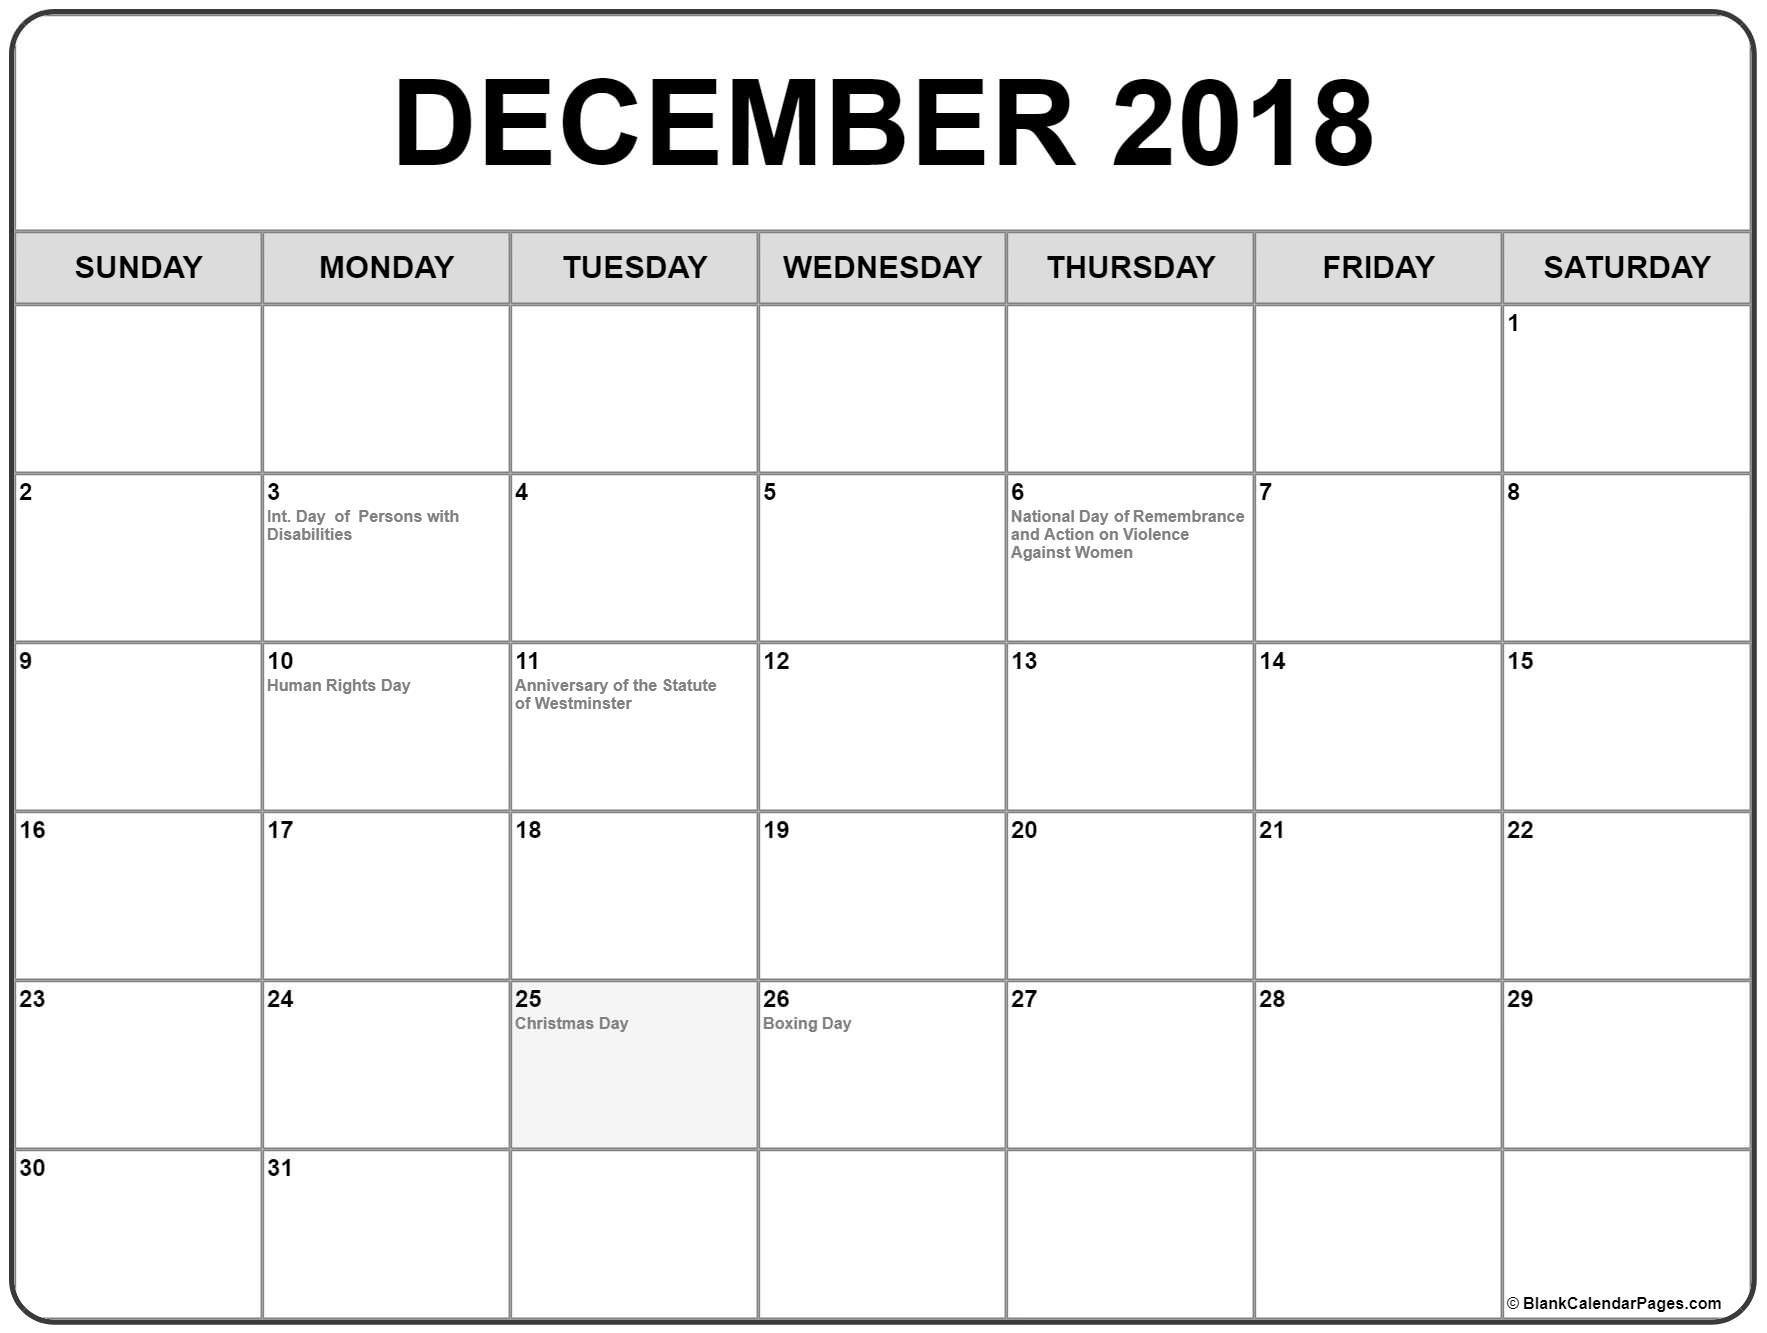 December 2018 Calendar With Canadian Holidays Holiday Calendar